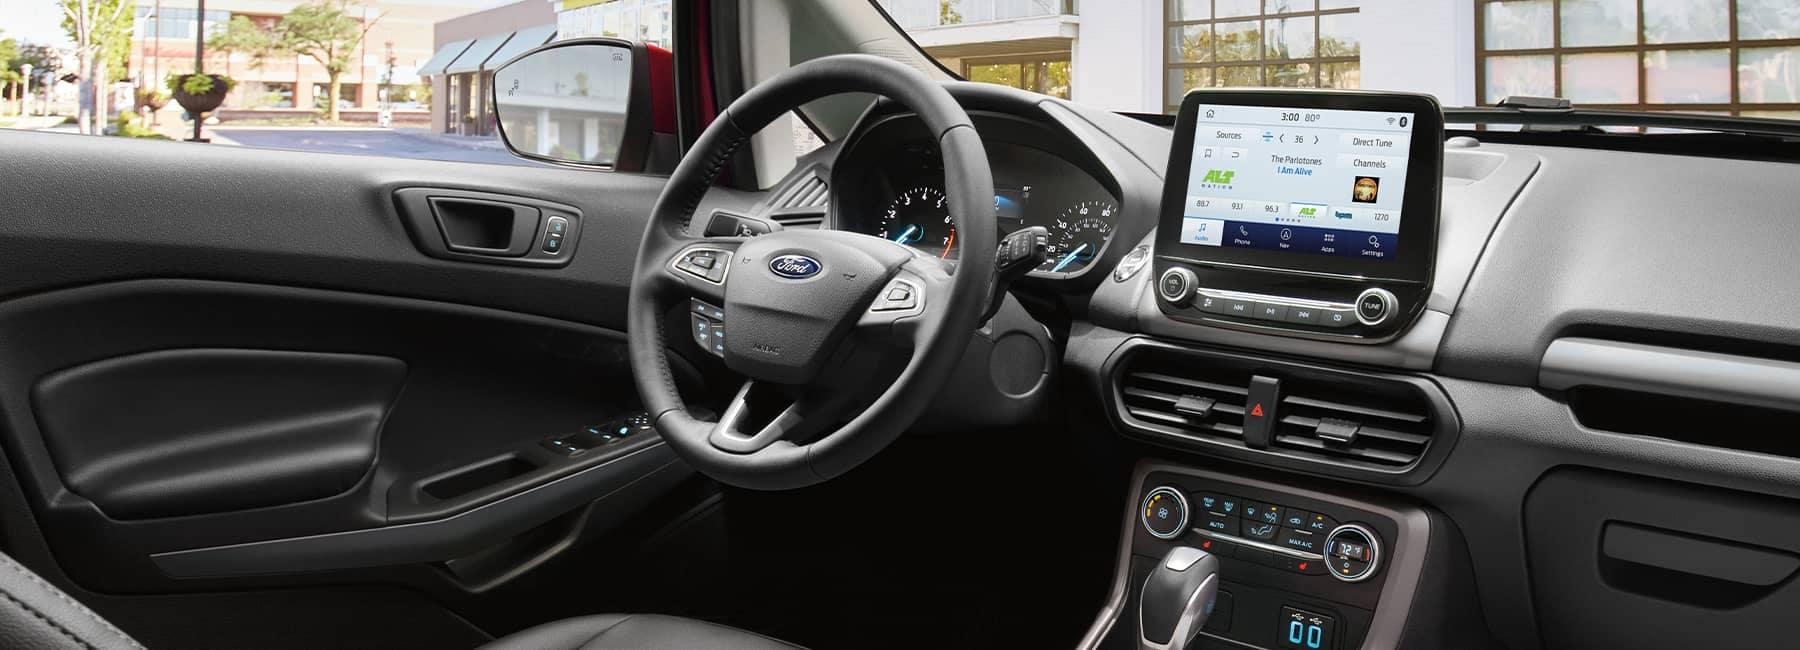 2021 Ford Ecosport interior dashboard